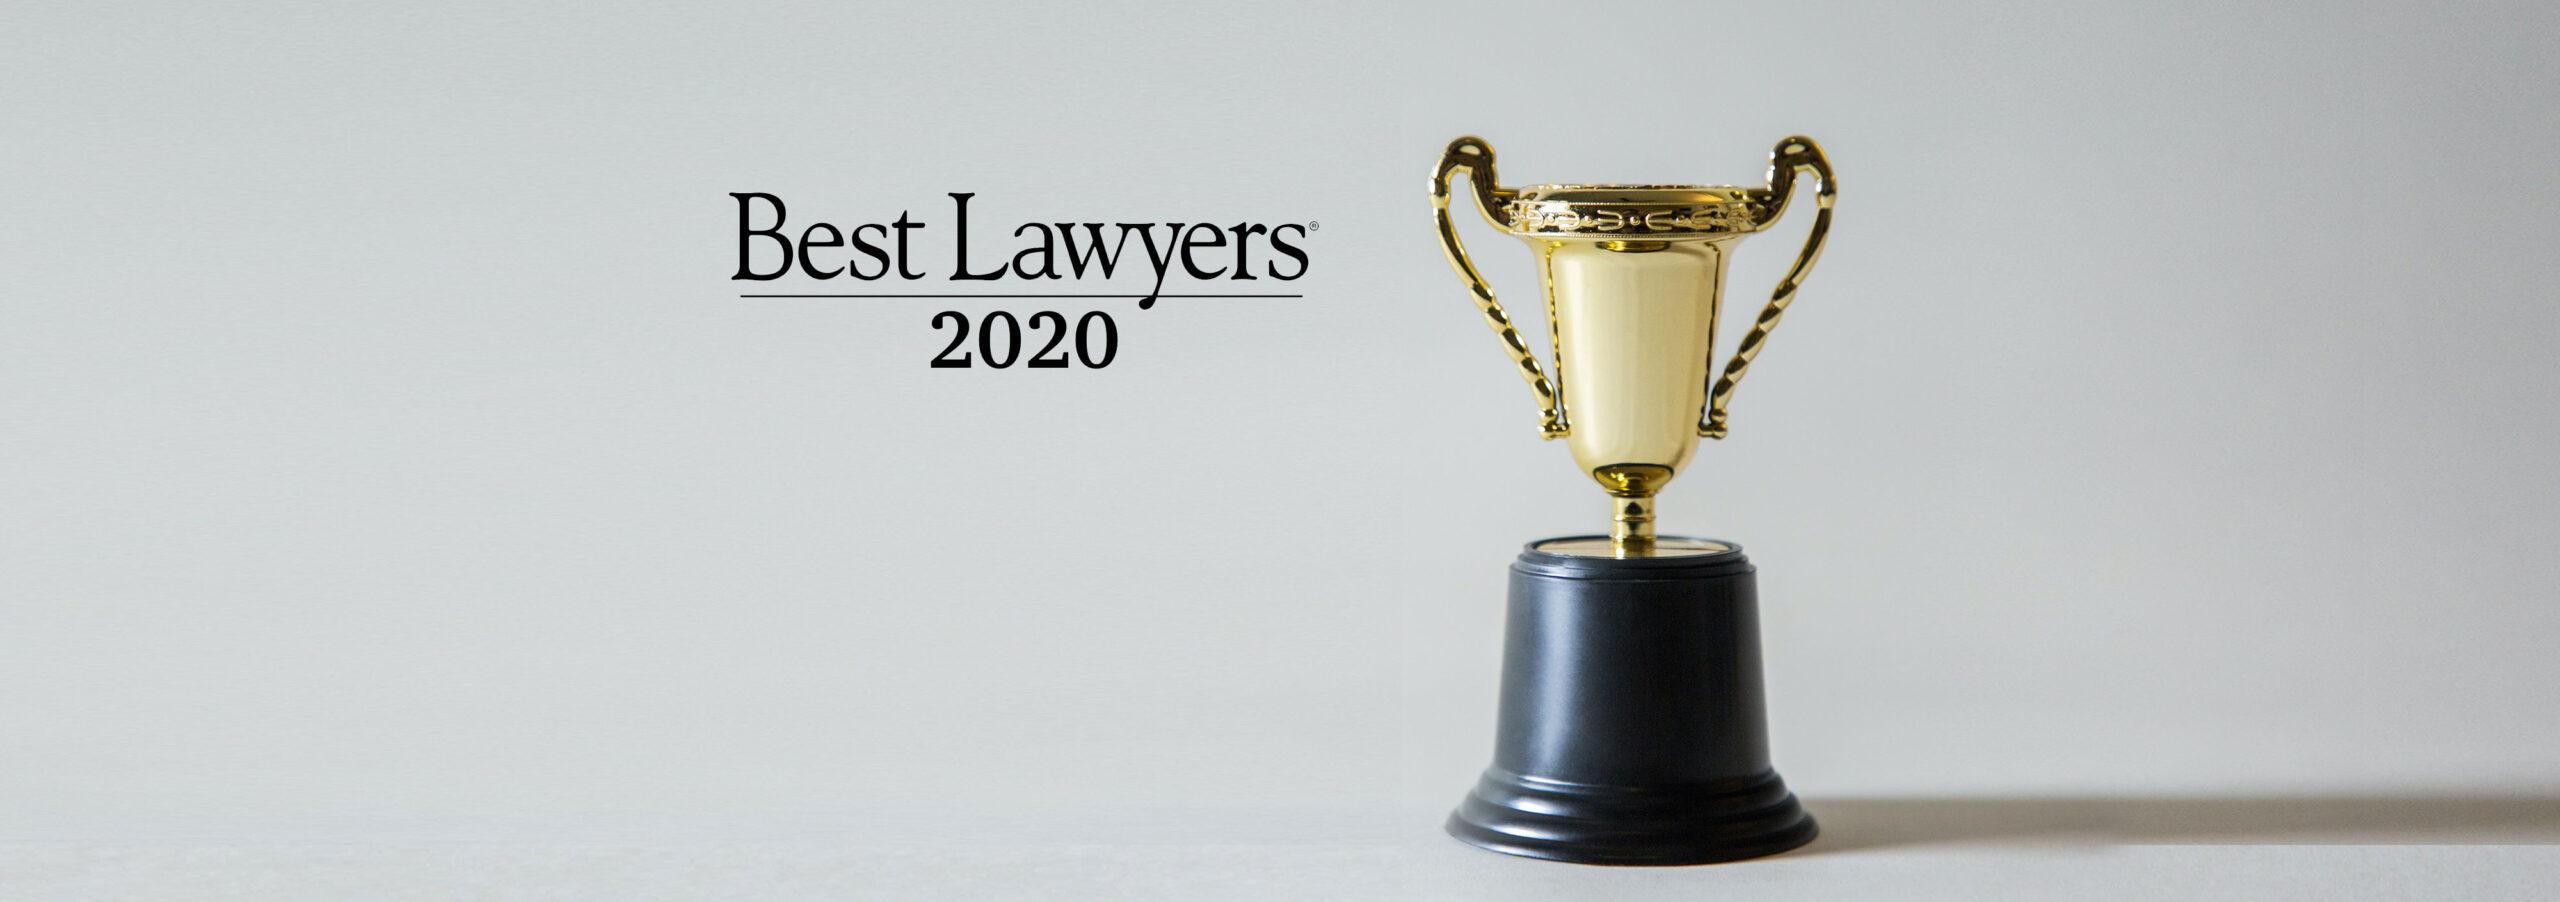 Classements Best Lawyers 2020